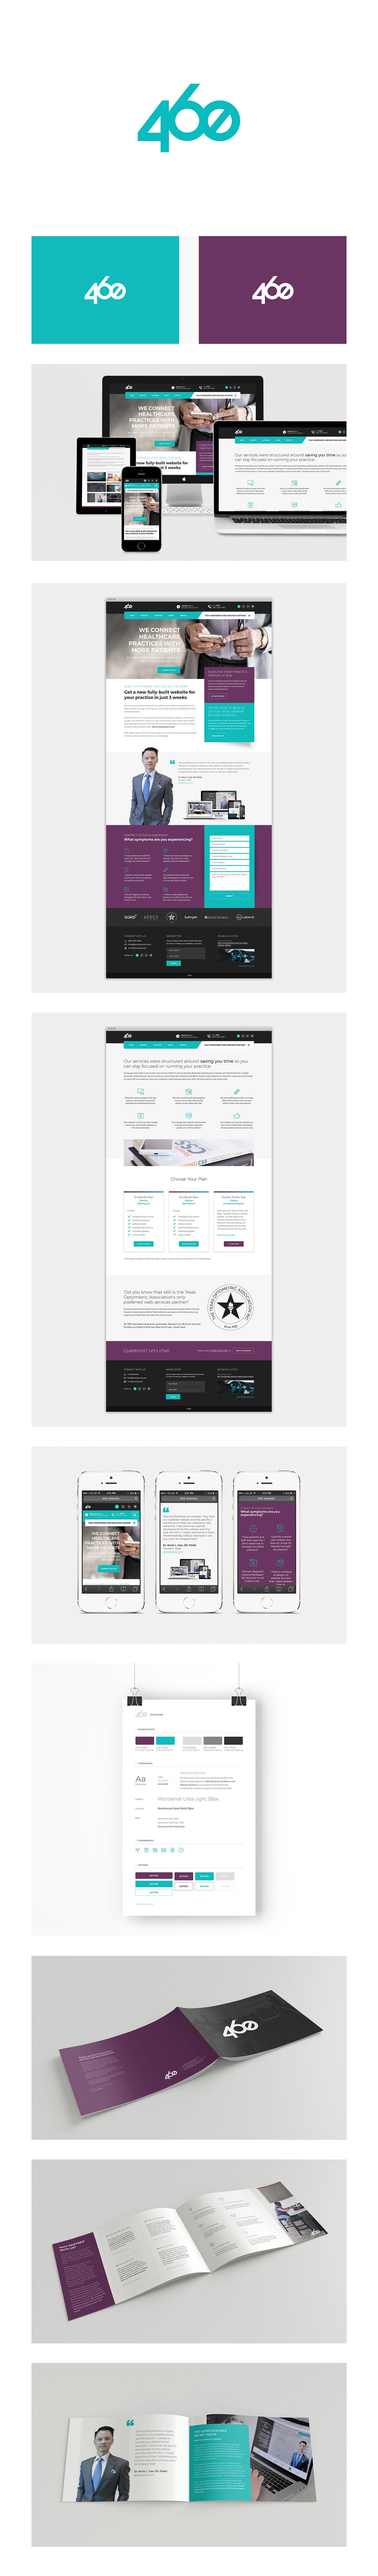 branding  Web Design  print design  graphic design  Logo Design